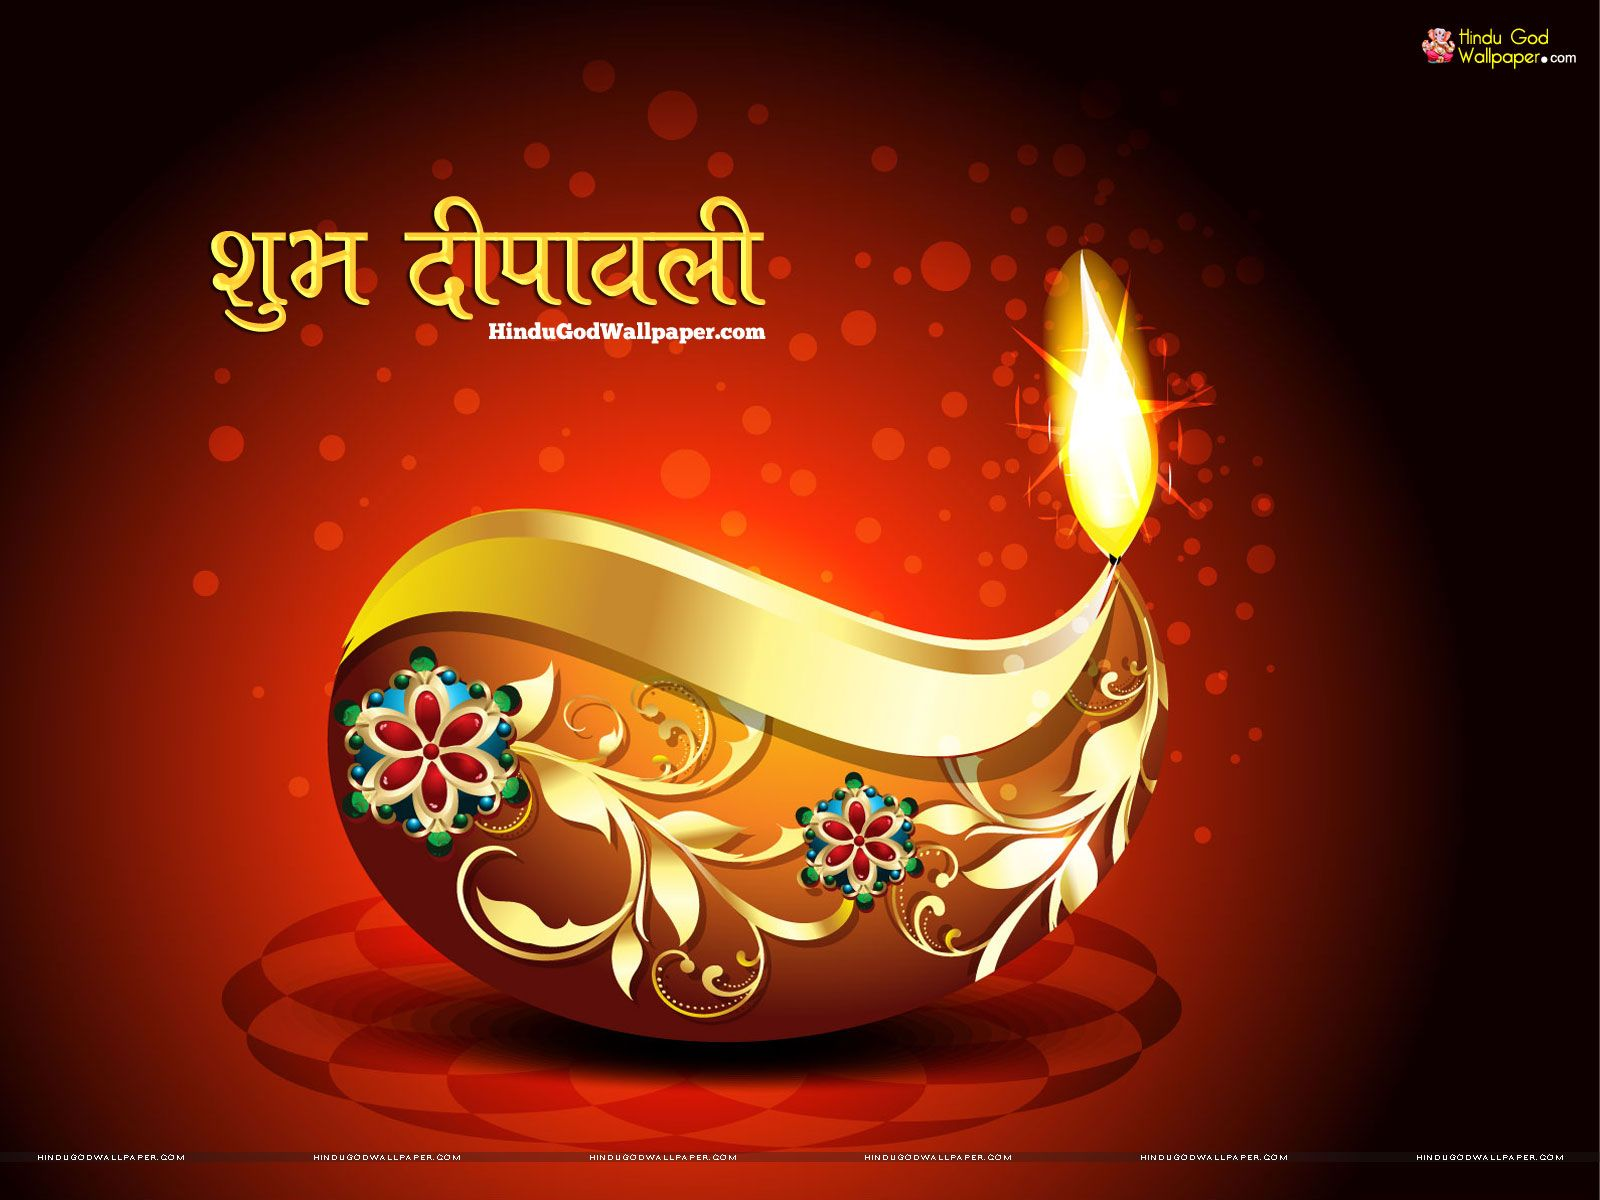 Deepavali Images And Wallpaper Download: Deepawali Deepak Wallpapers, Photos & Images Download